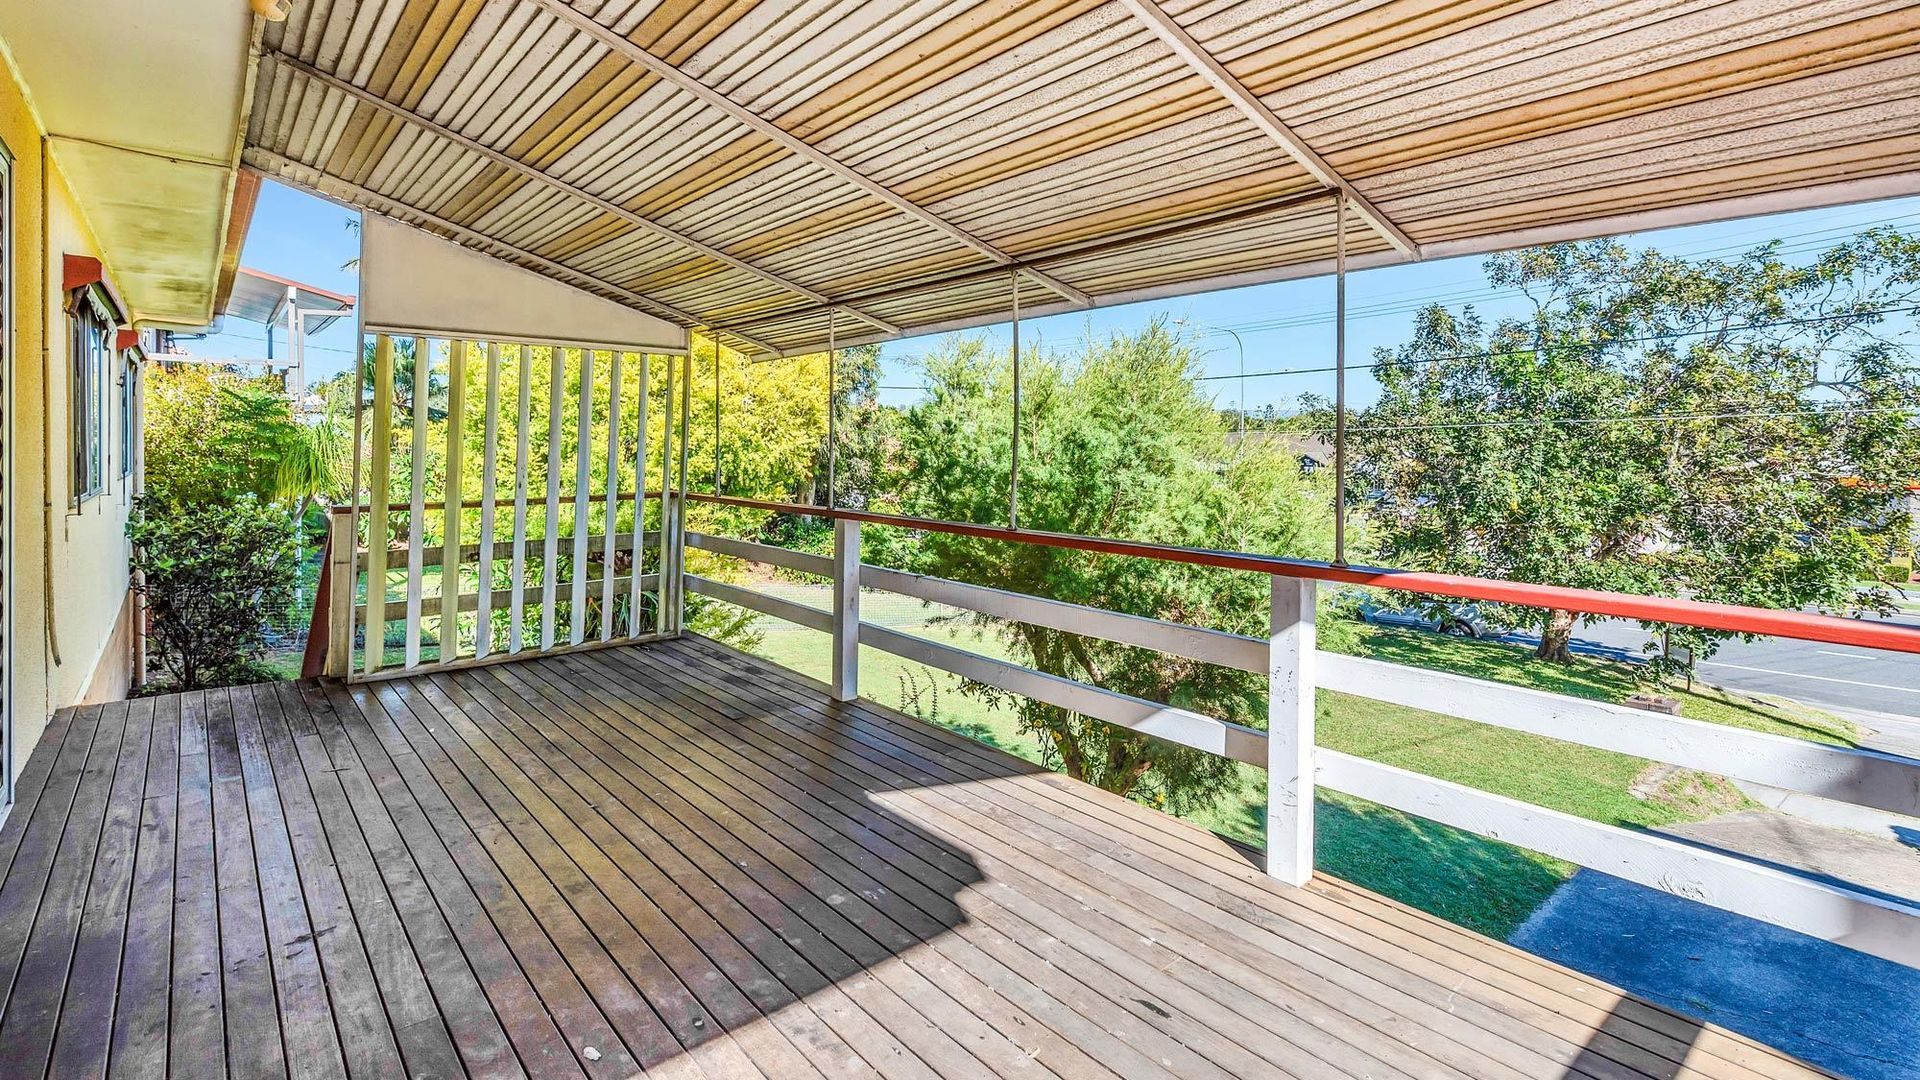 102 West Burleigh Road, Burleigh Heads QLD 4220, Image 1